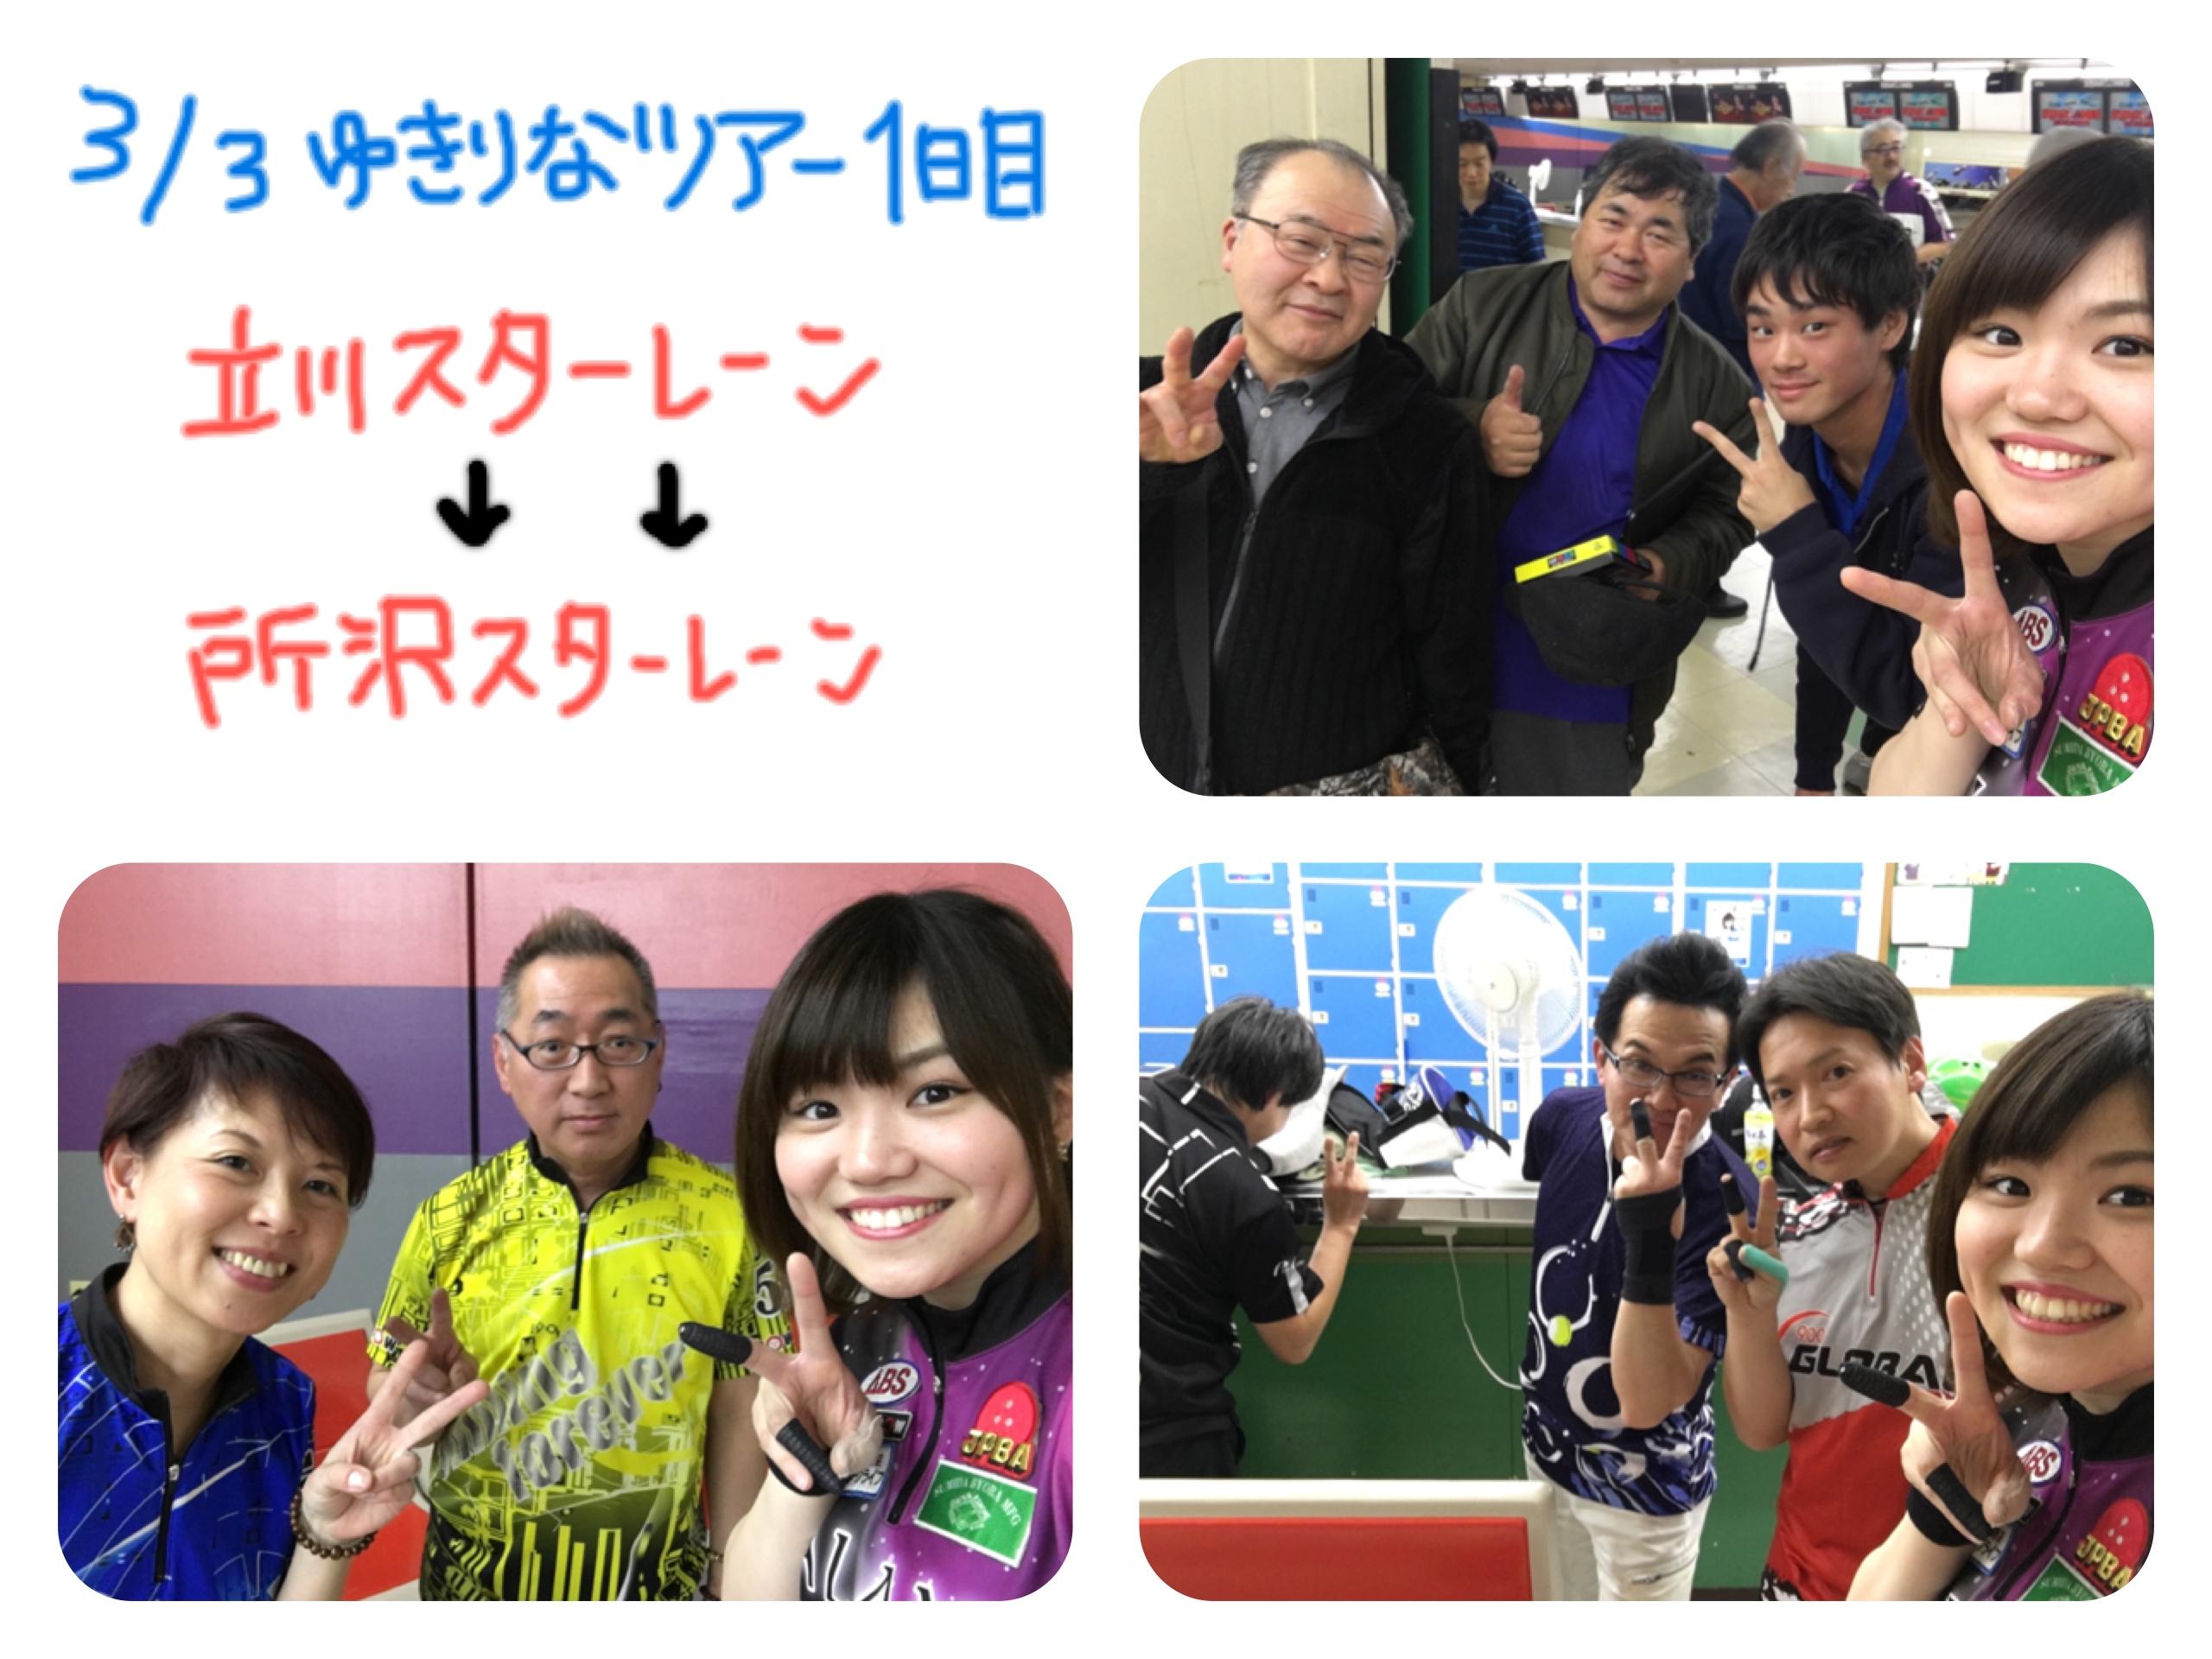 IMG_7358.JPG